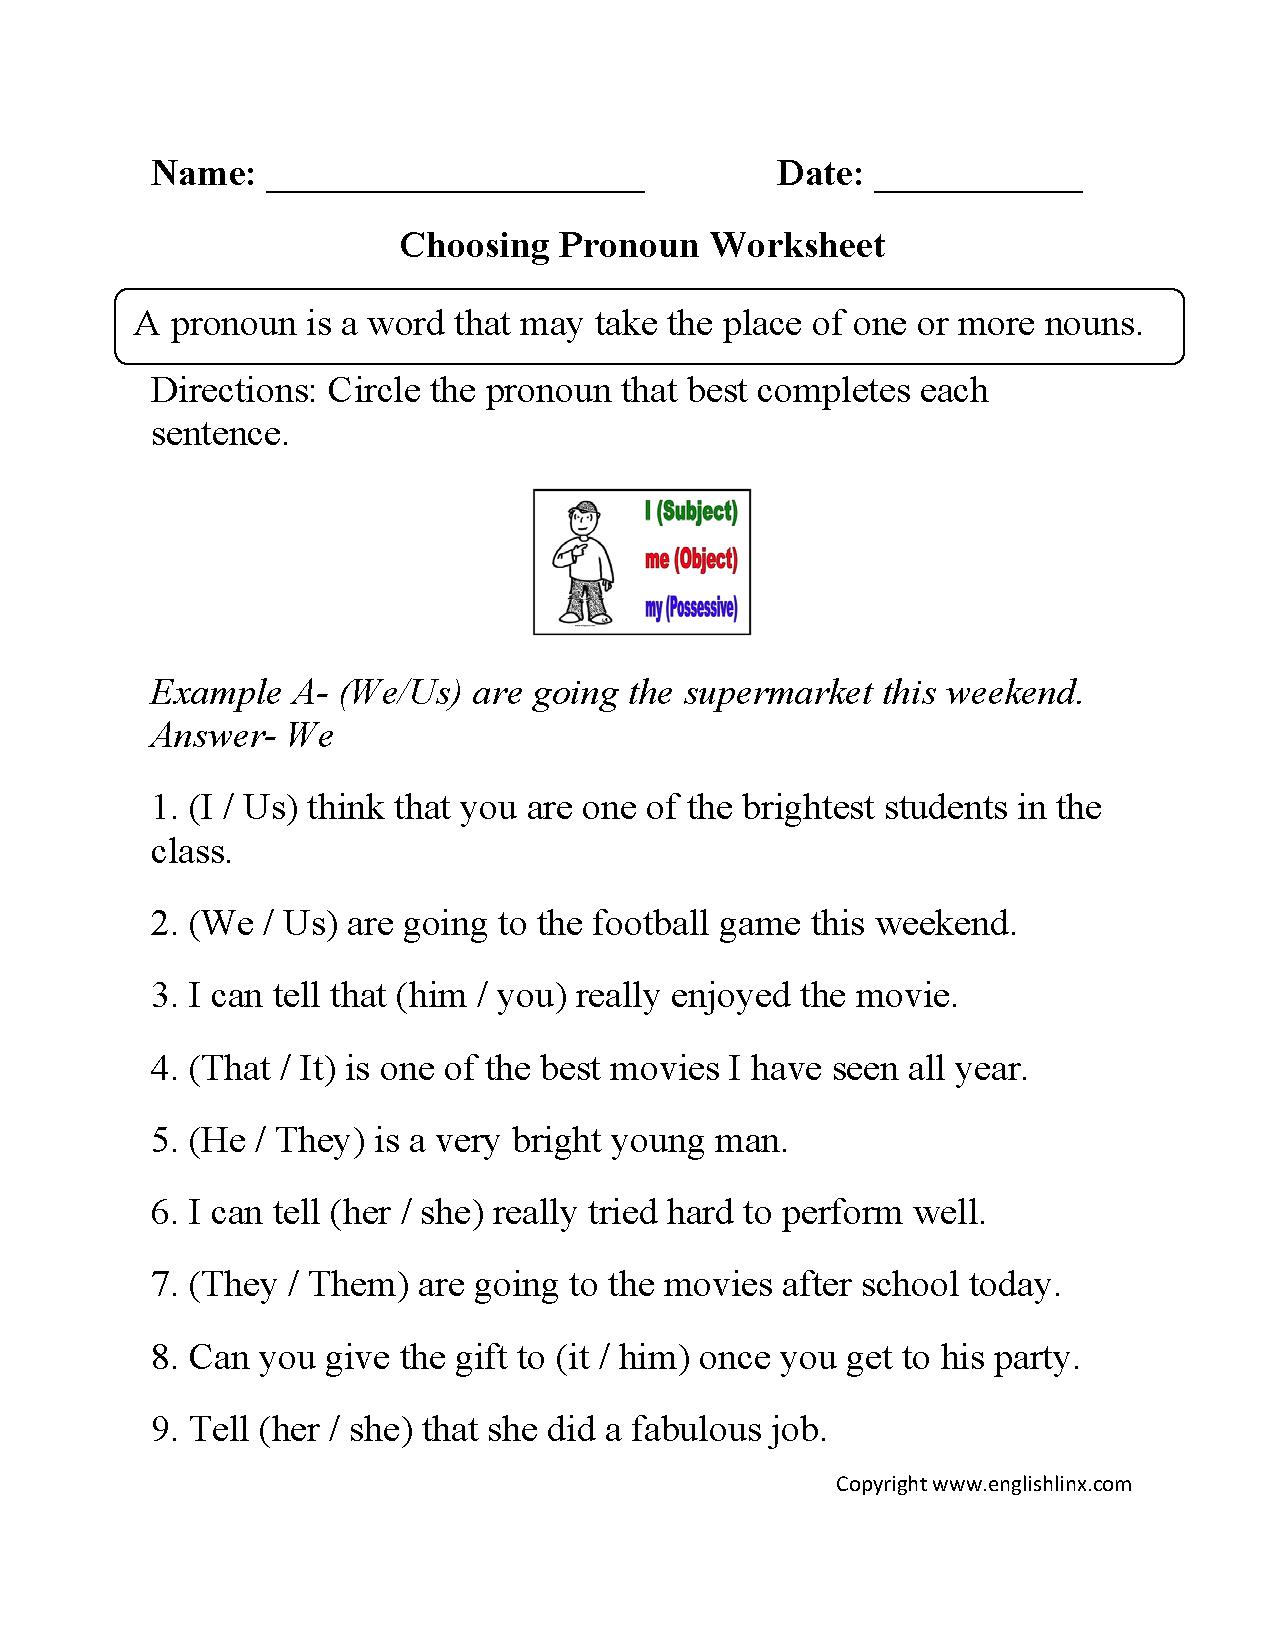 Pronoun Worksheets Parts of speech Pinterest